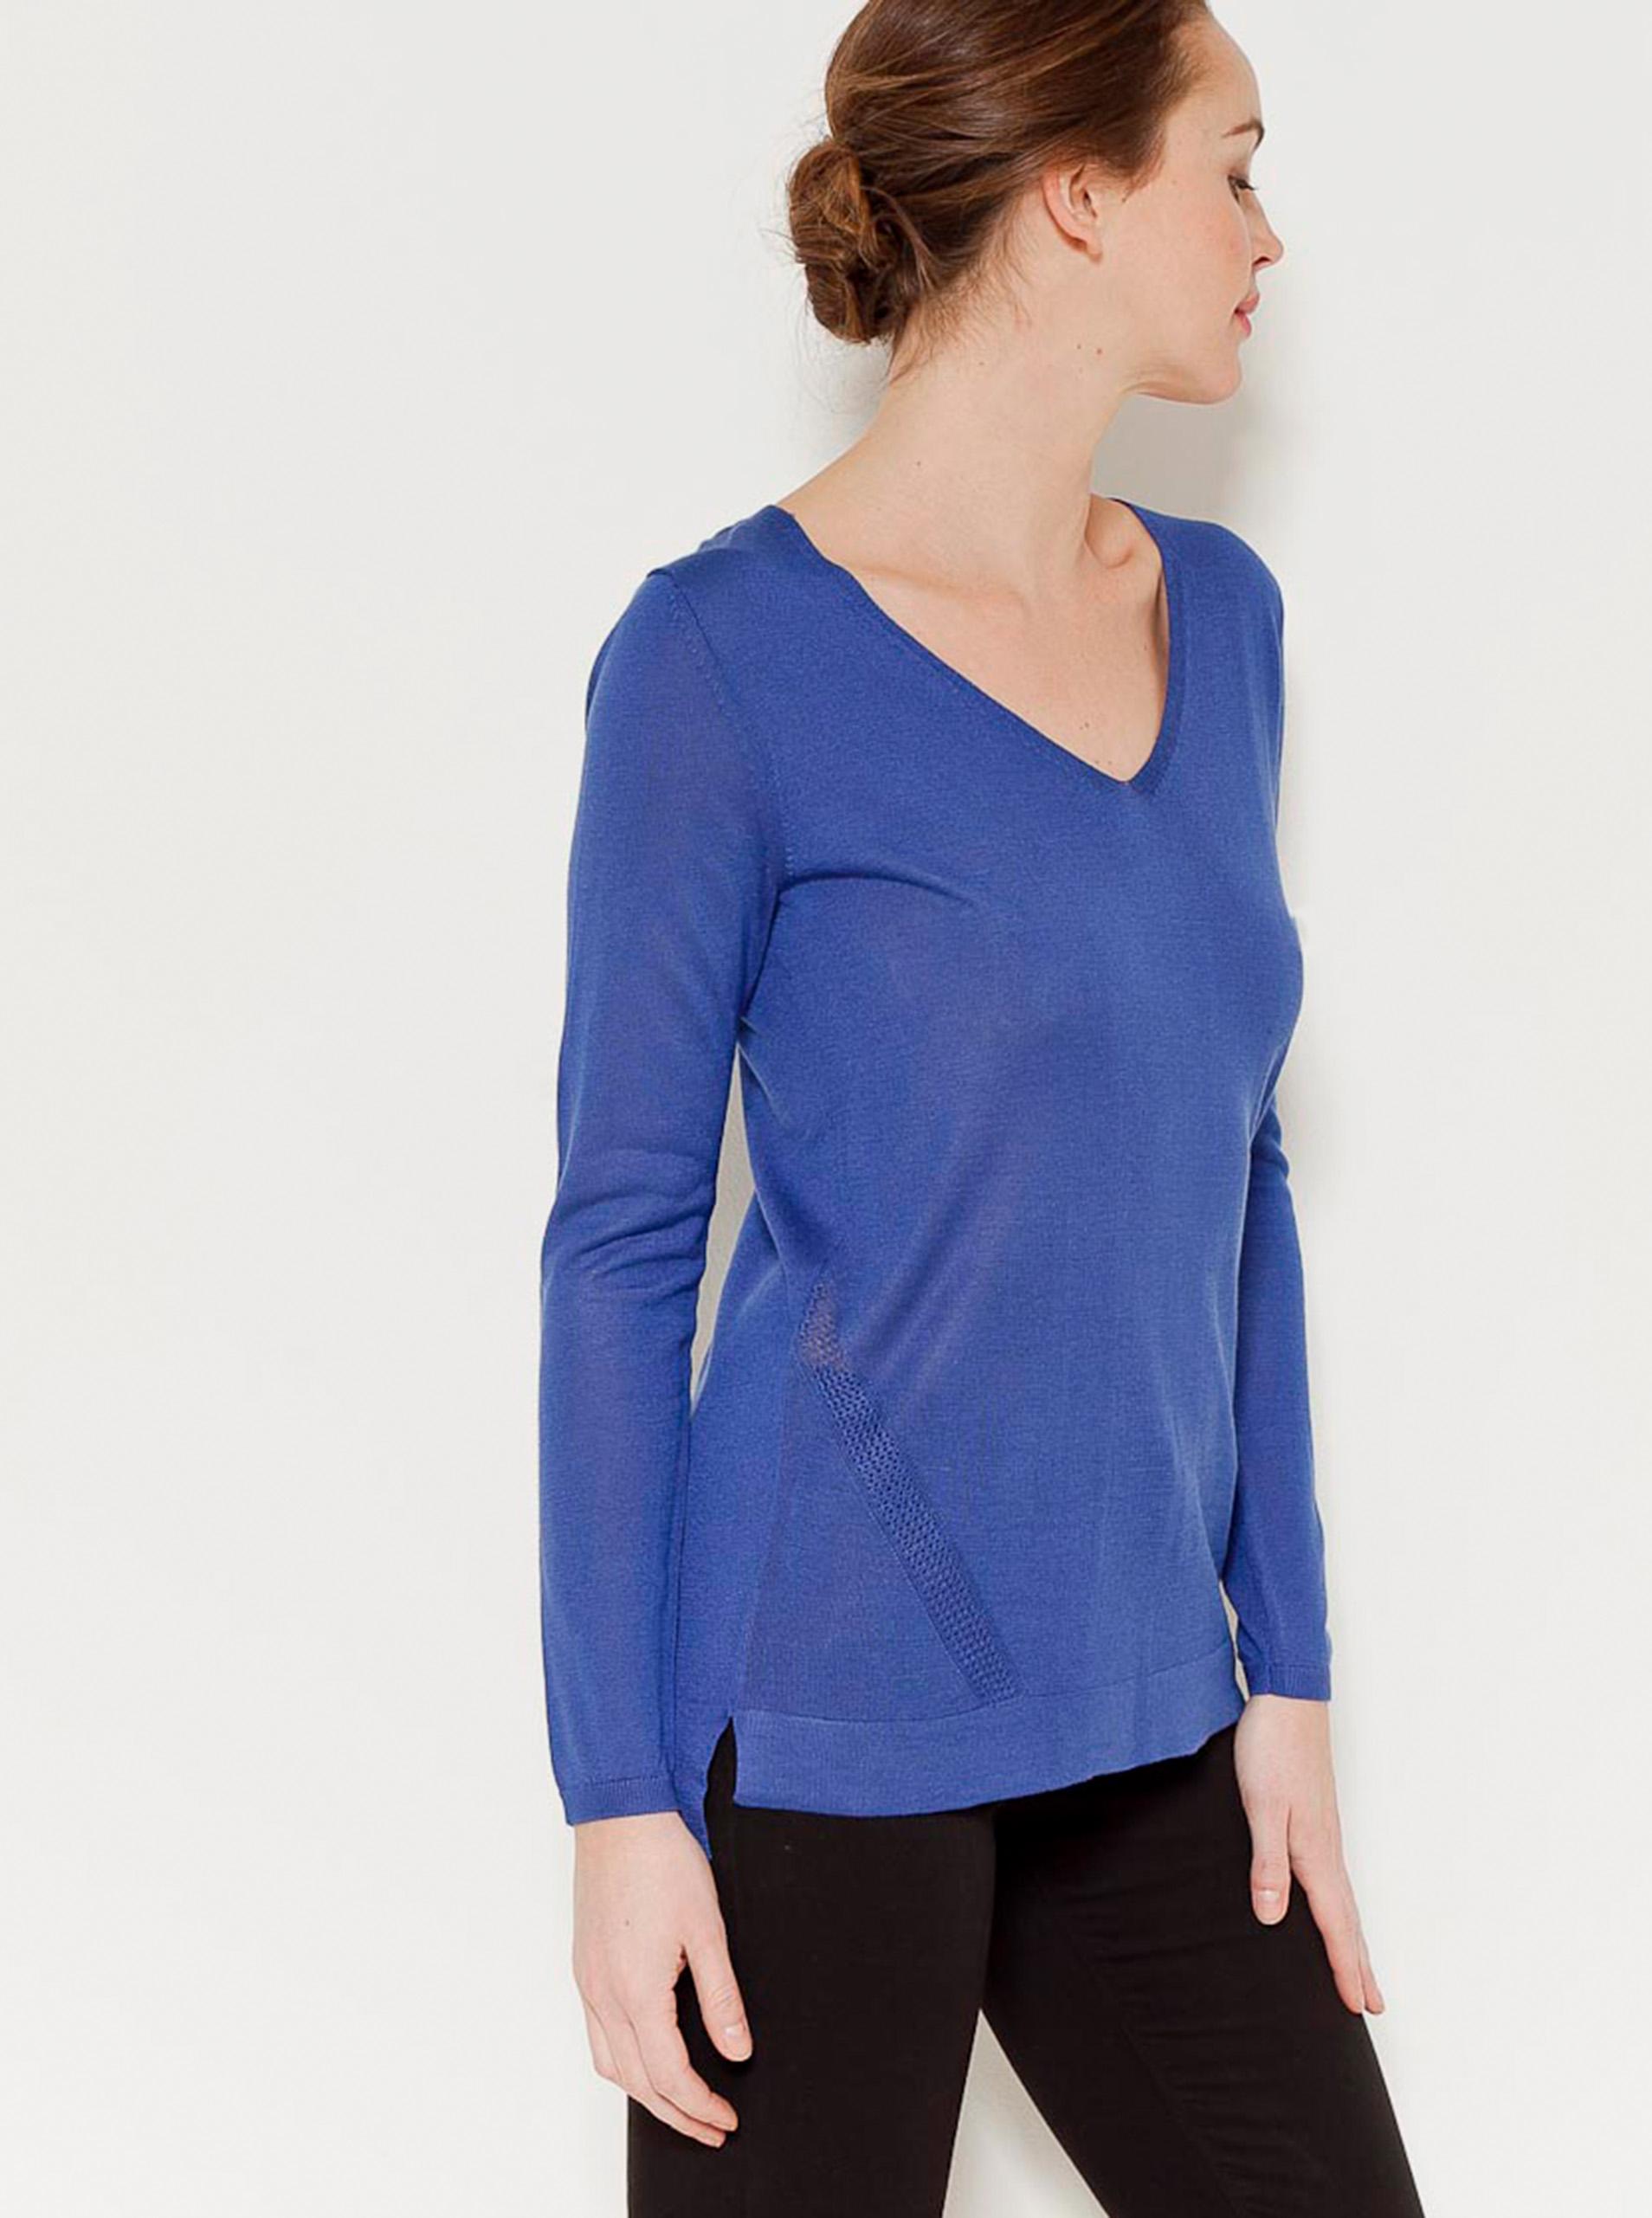 CAMAIEU Women's t-shirt blue